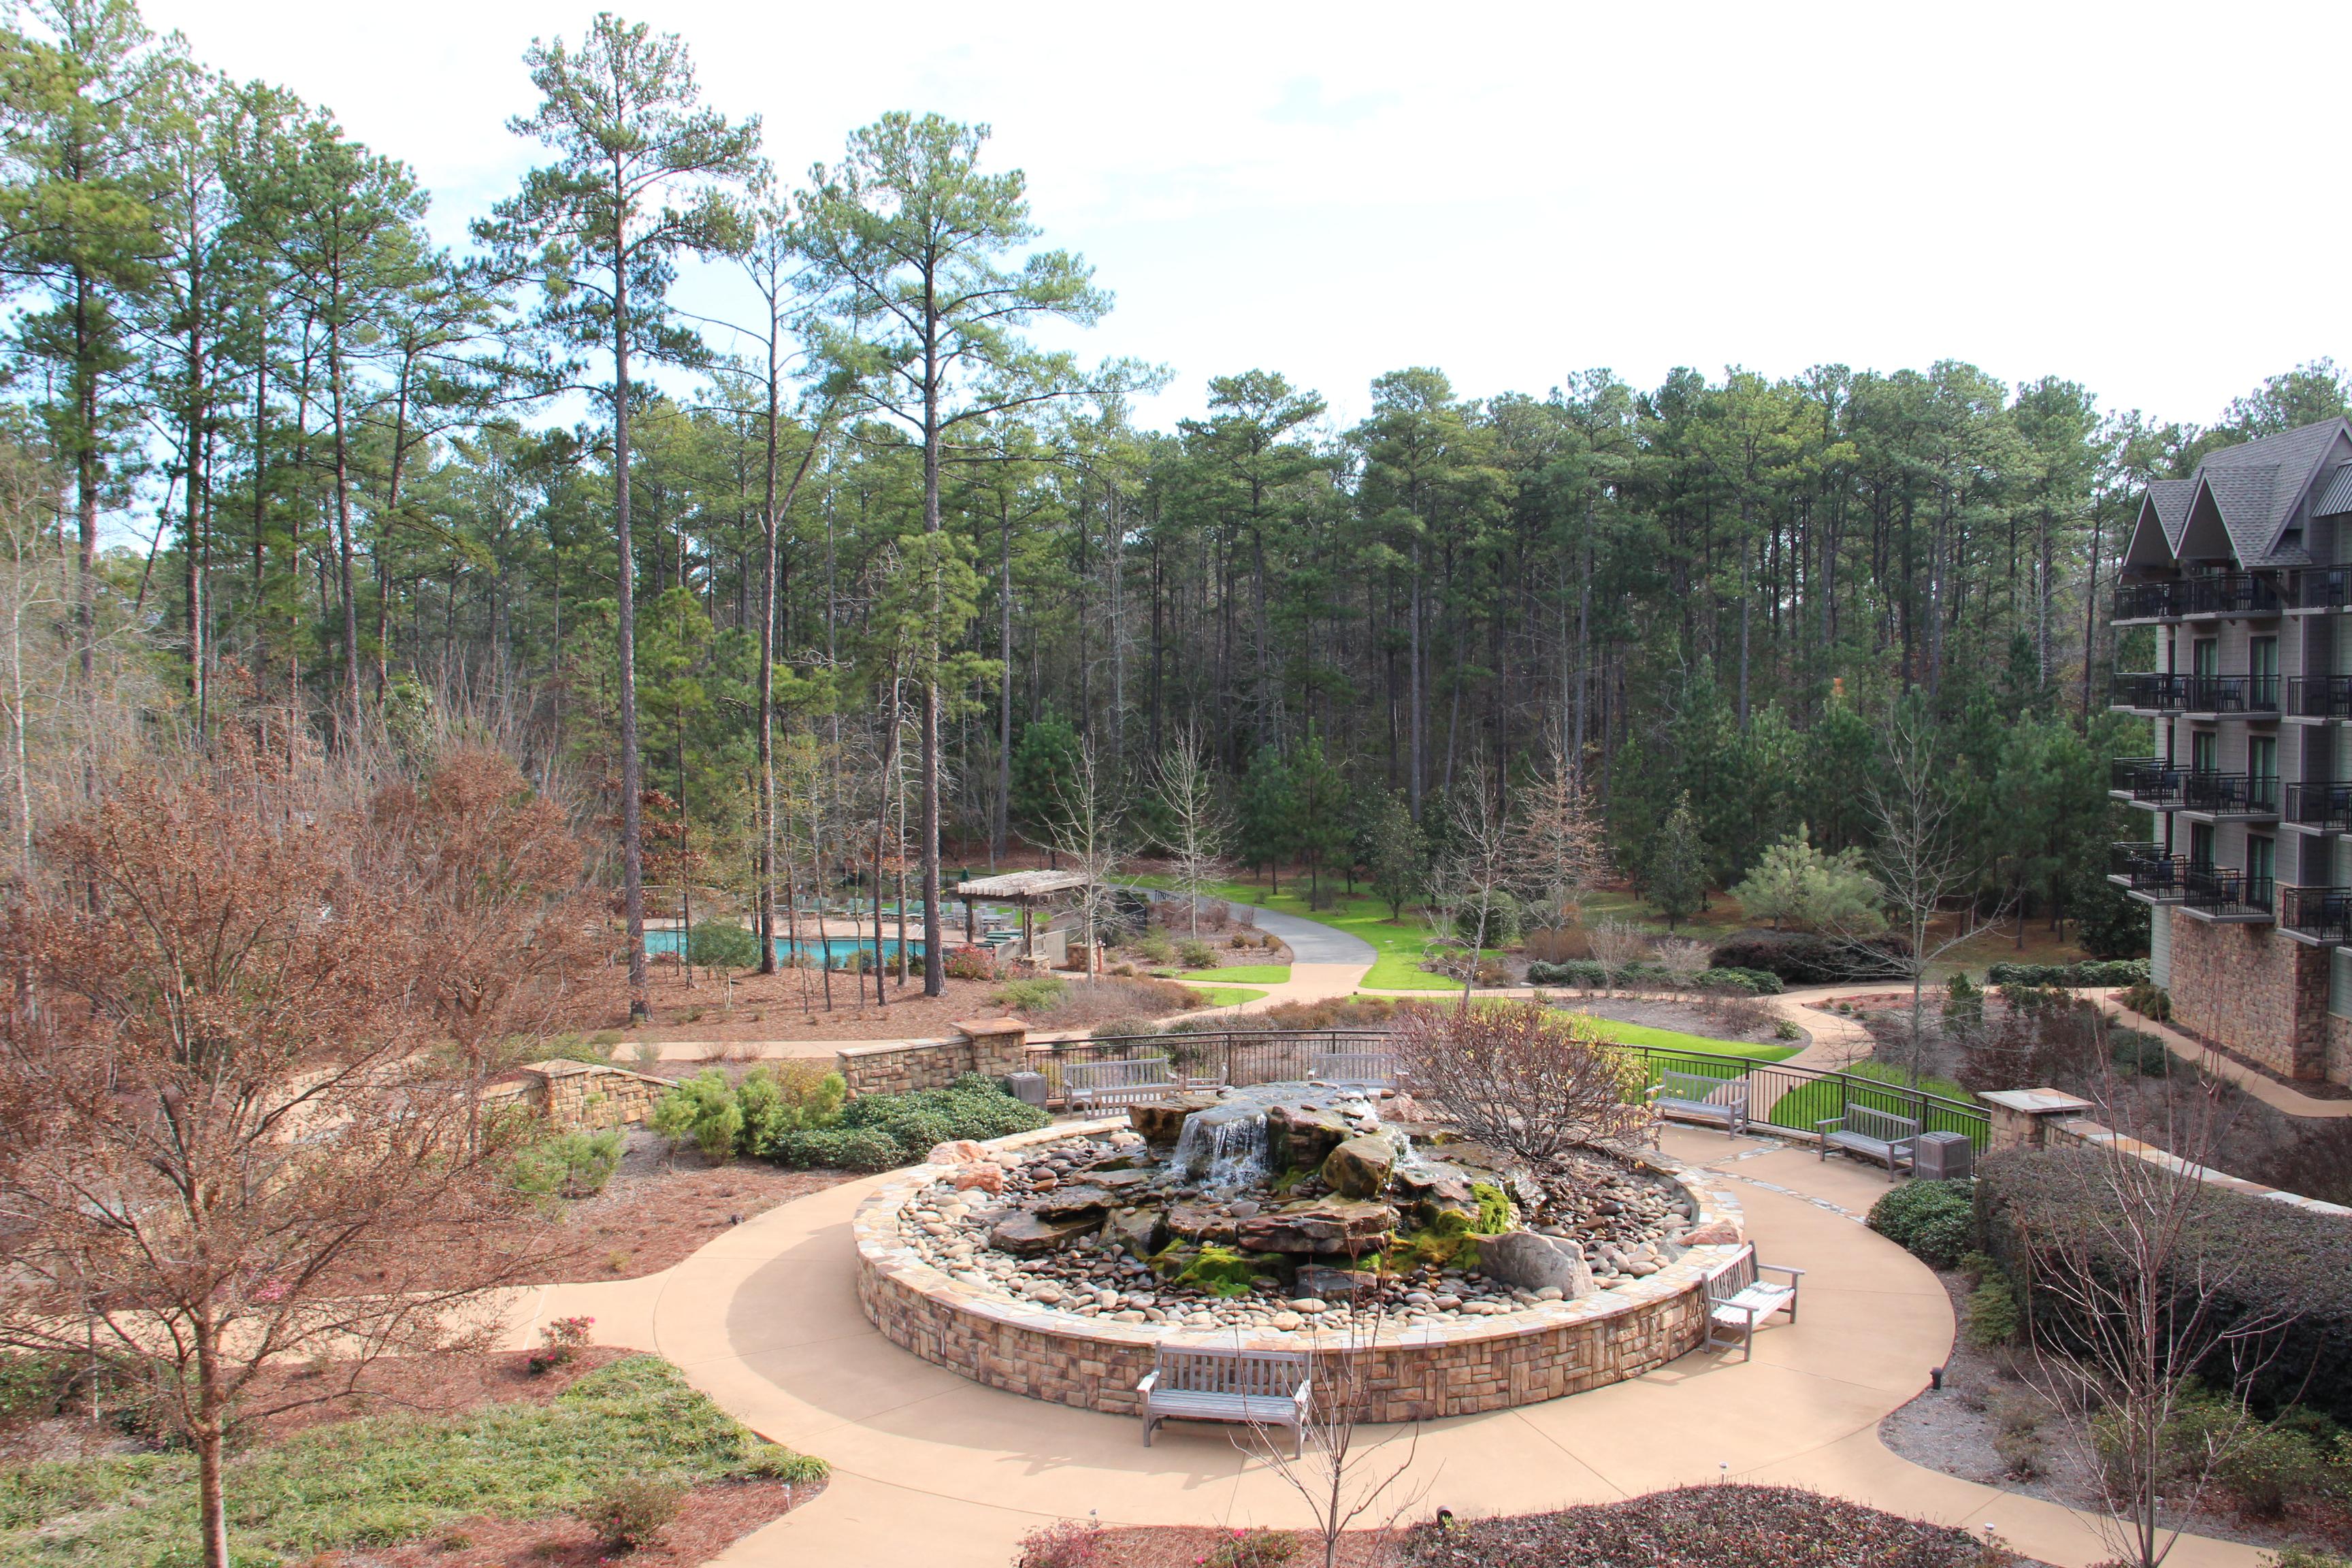 Callaway Gardens 100 Meadow View Lane Pine Mountain Ga Location Hours And Website